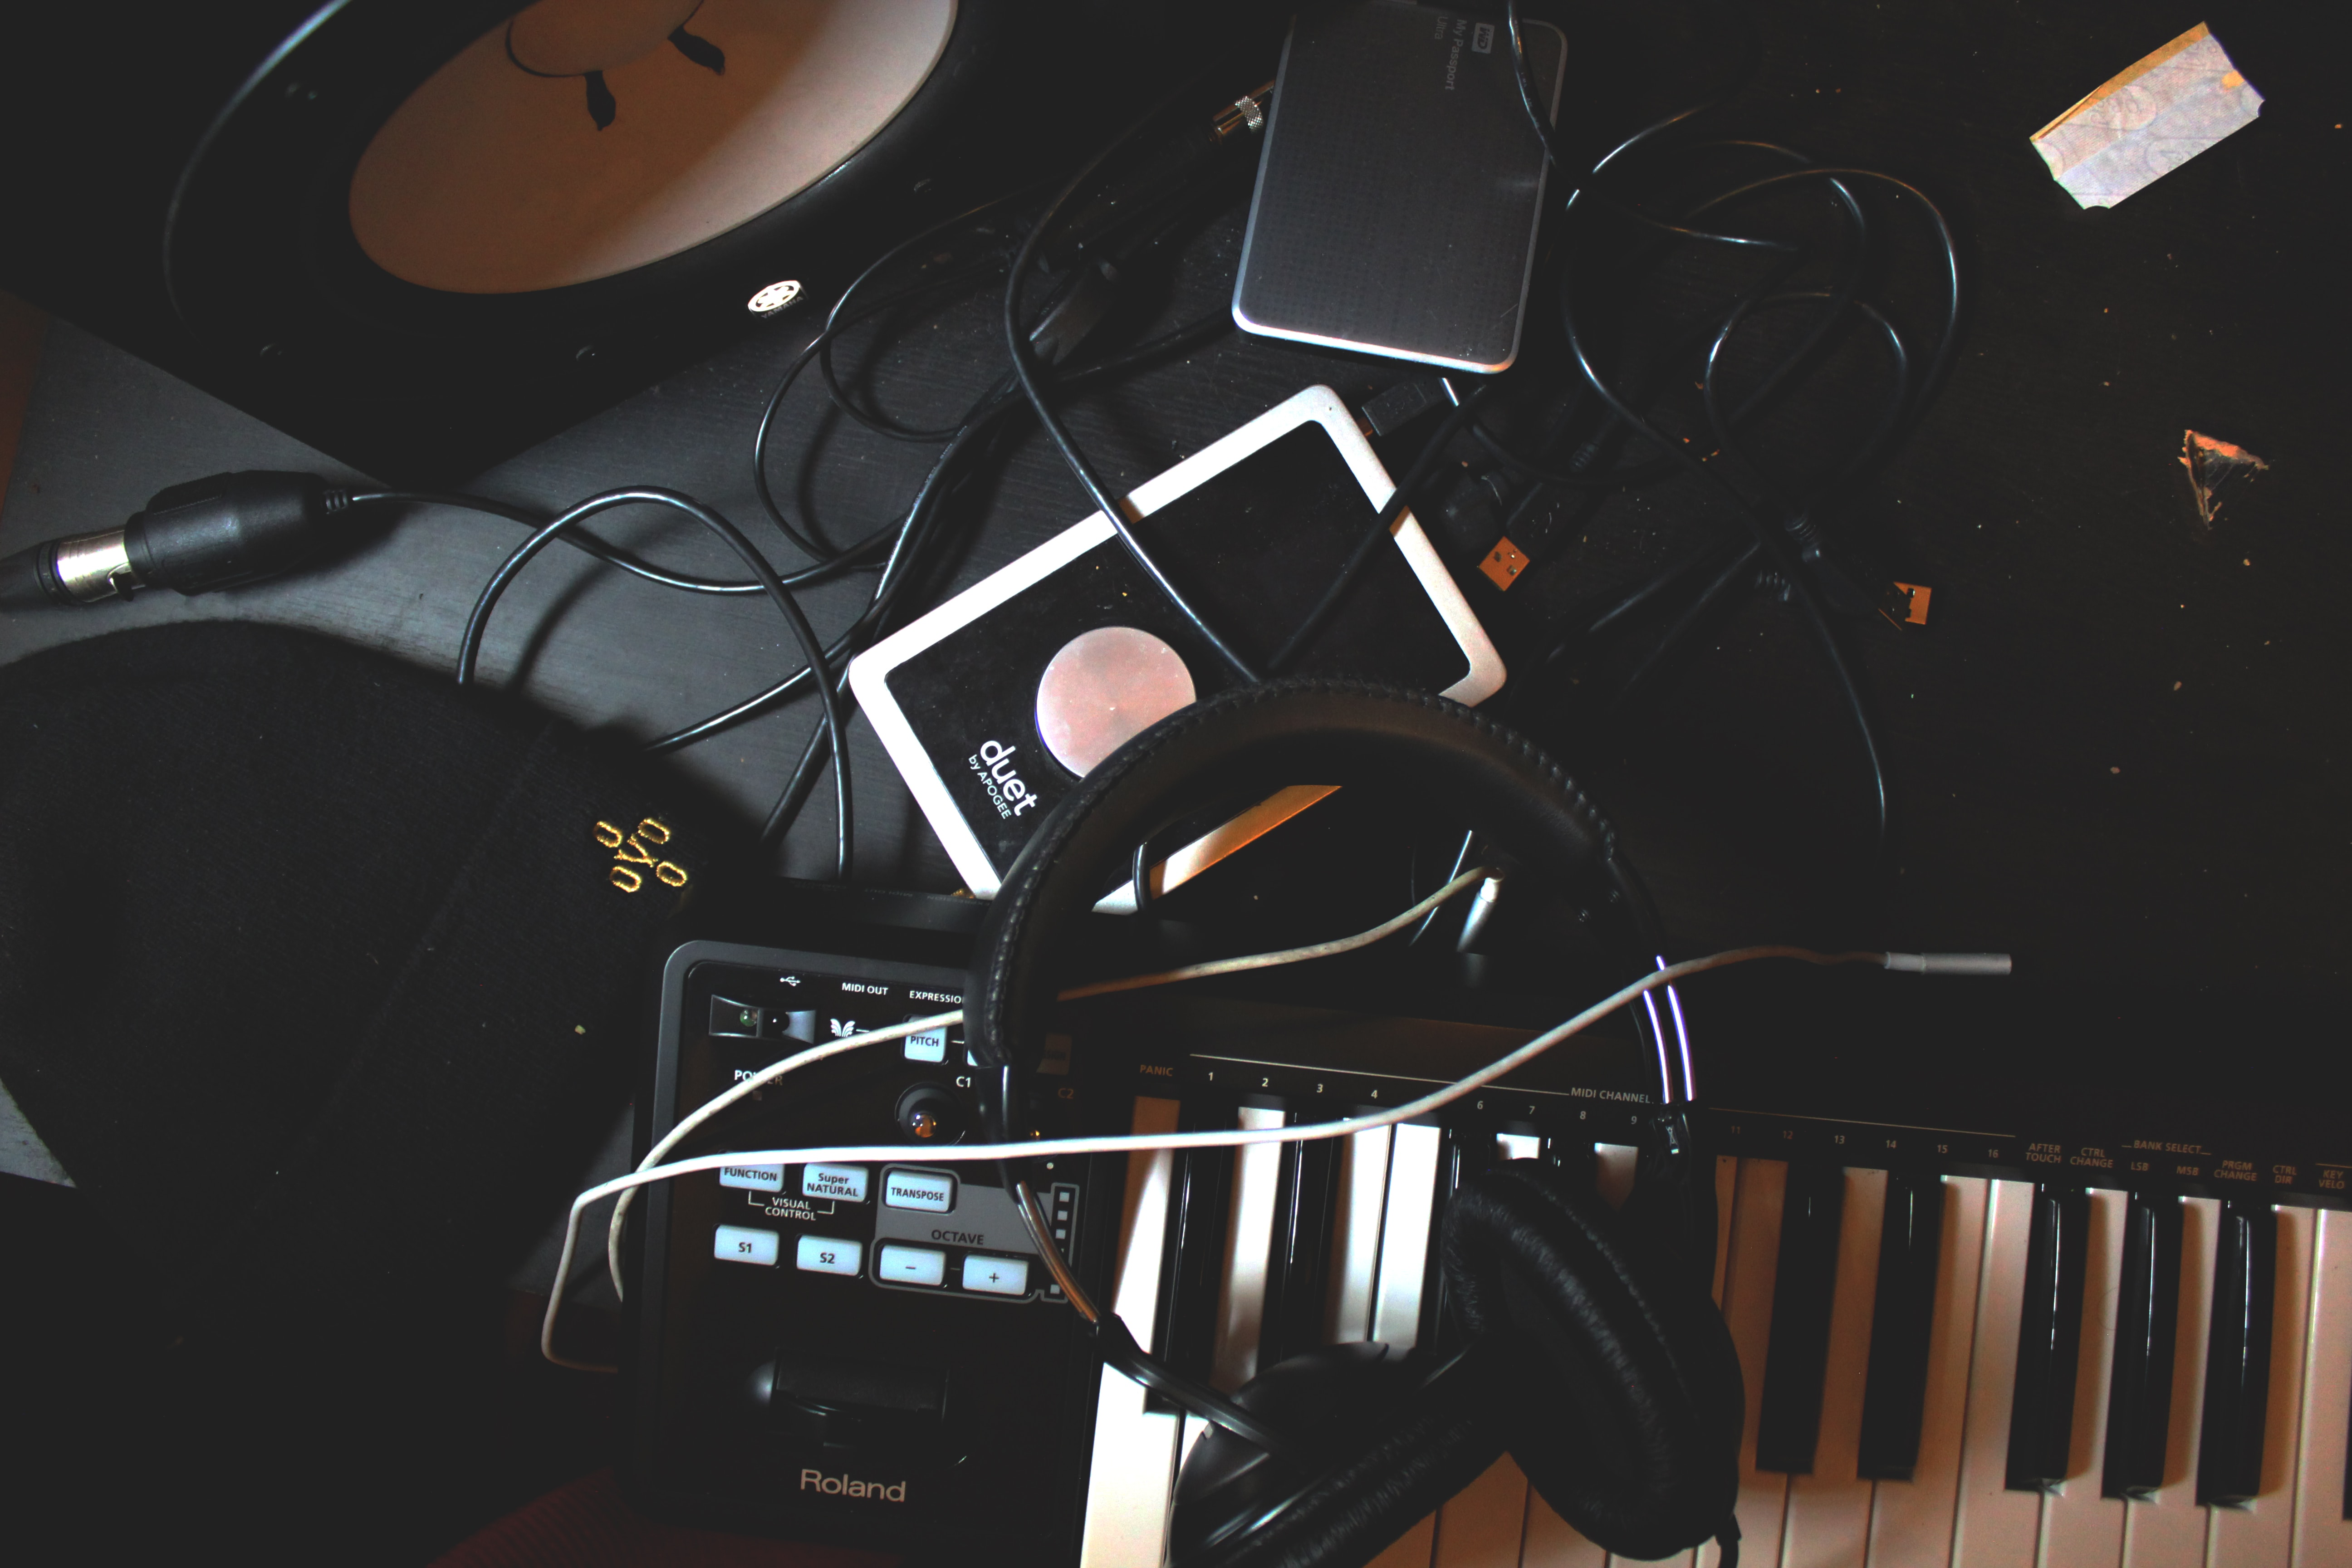 Music recording equipment on a desk